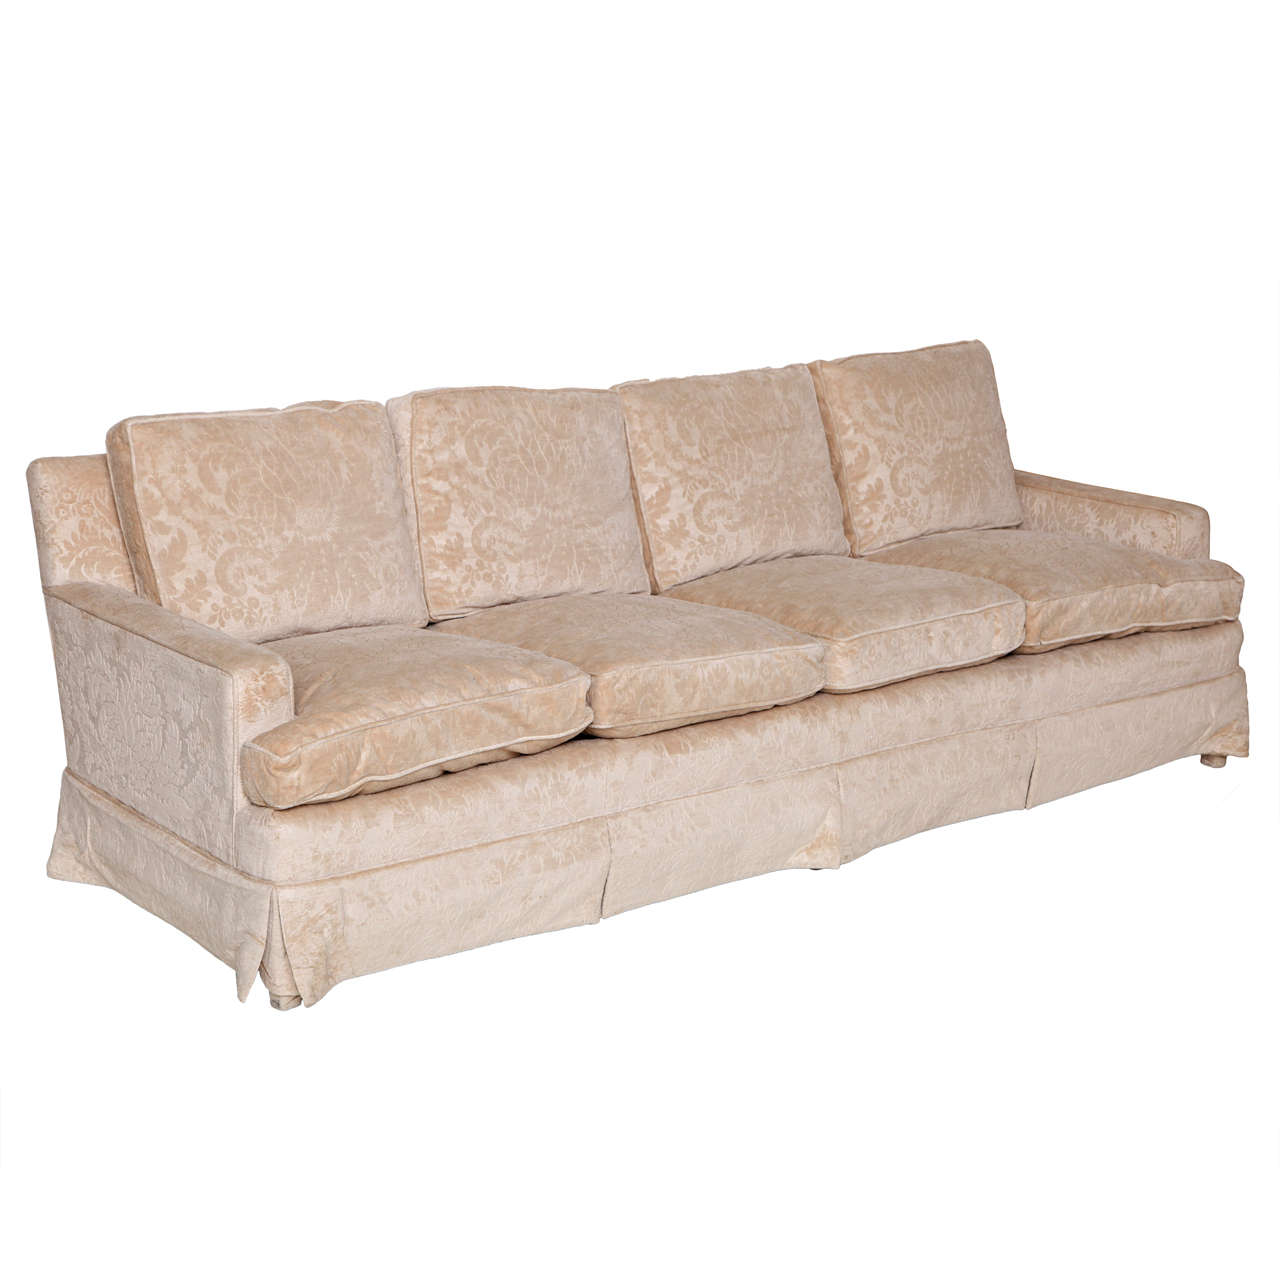 Furniture Johor Bahru Leather Sofa: Mid-Century Modern Four-Seat Sofa At 1stdibs